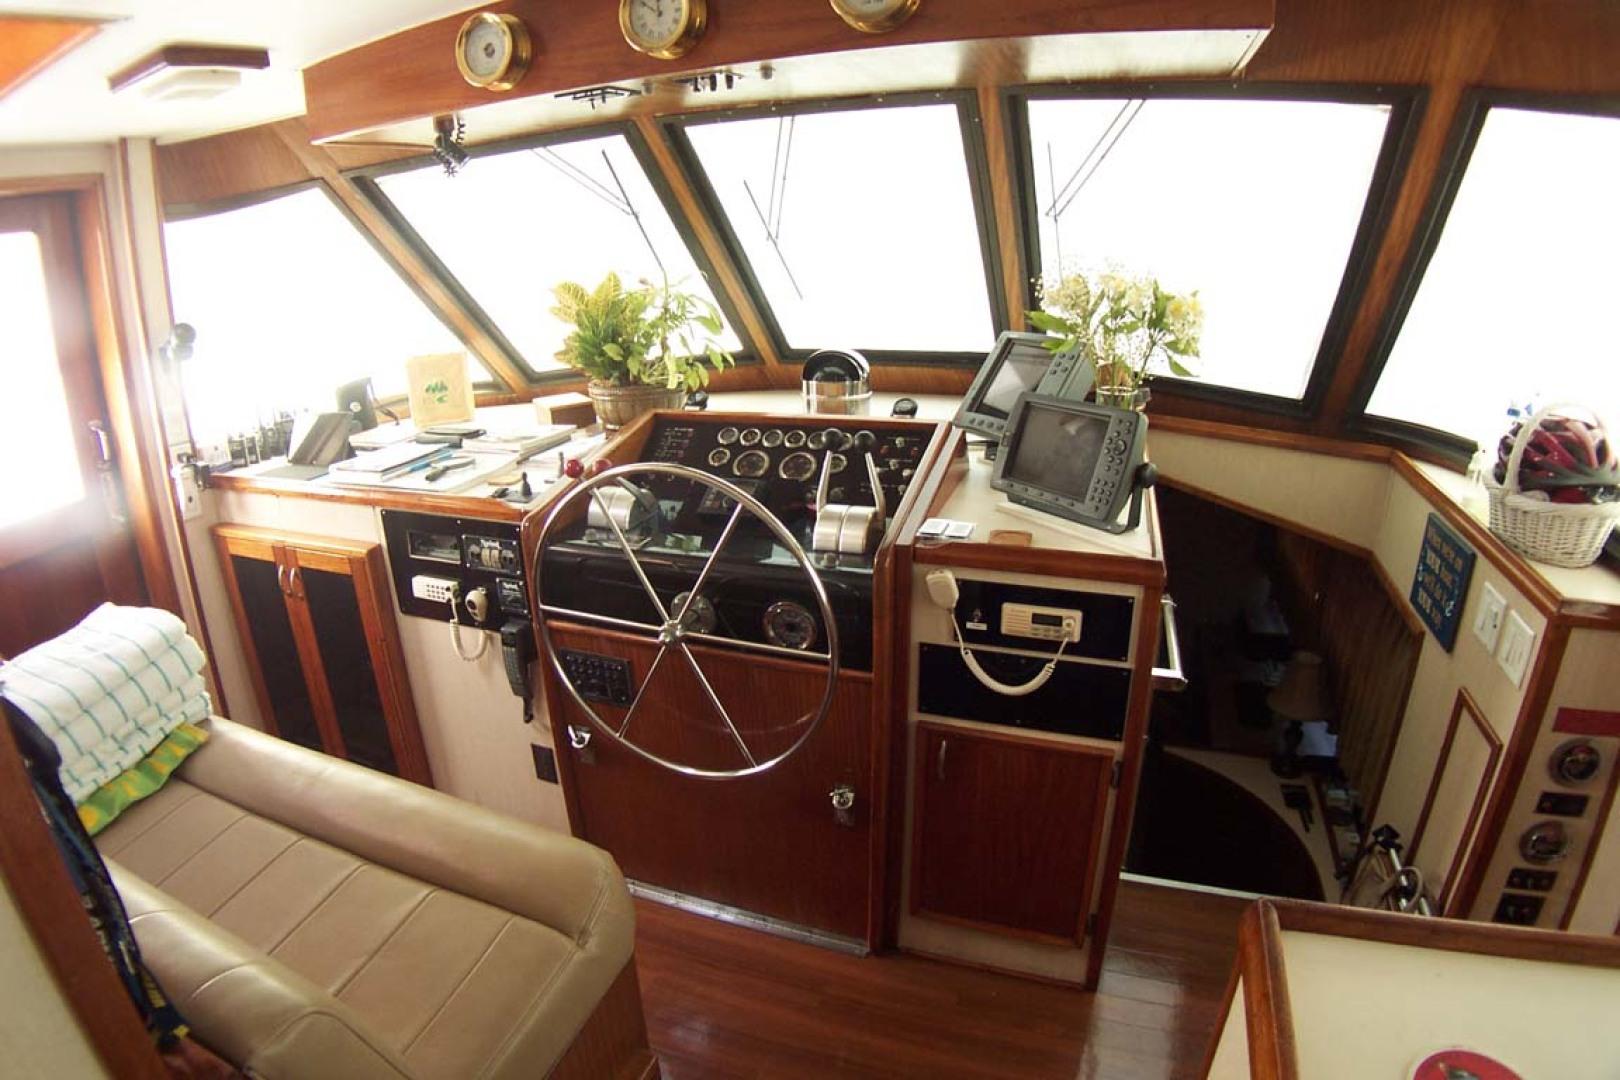 Hatteras-61 Motoryacht 1980-Piece A Cake Ft. Pierce-Florida-United States-Wheelhouse Fwd-1094503 | Thumbnail